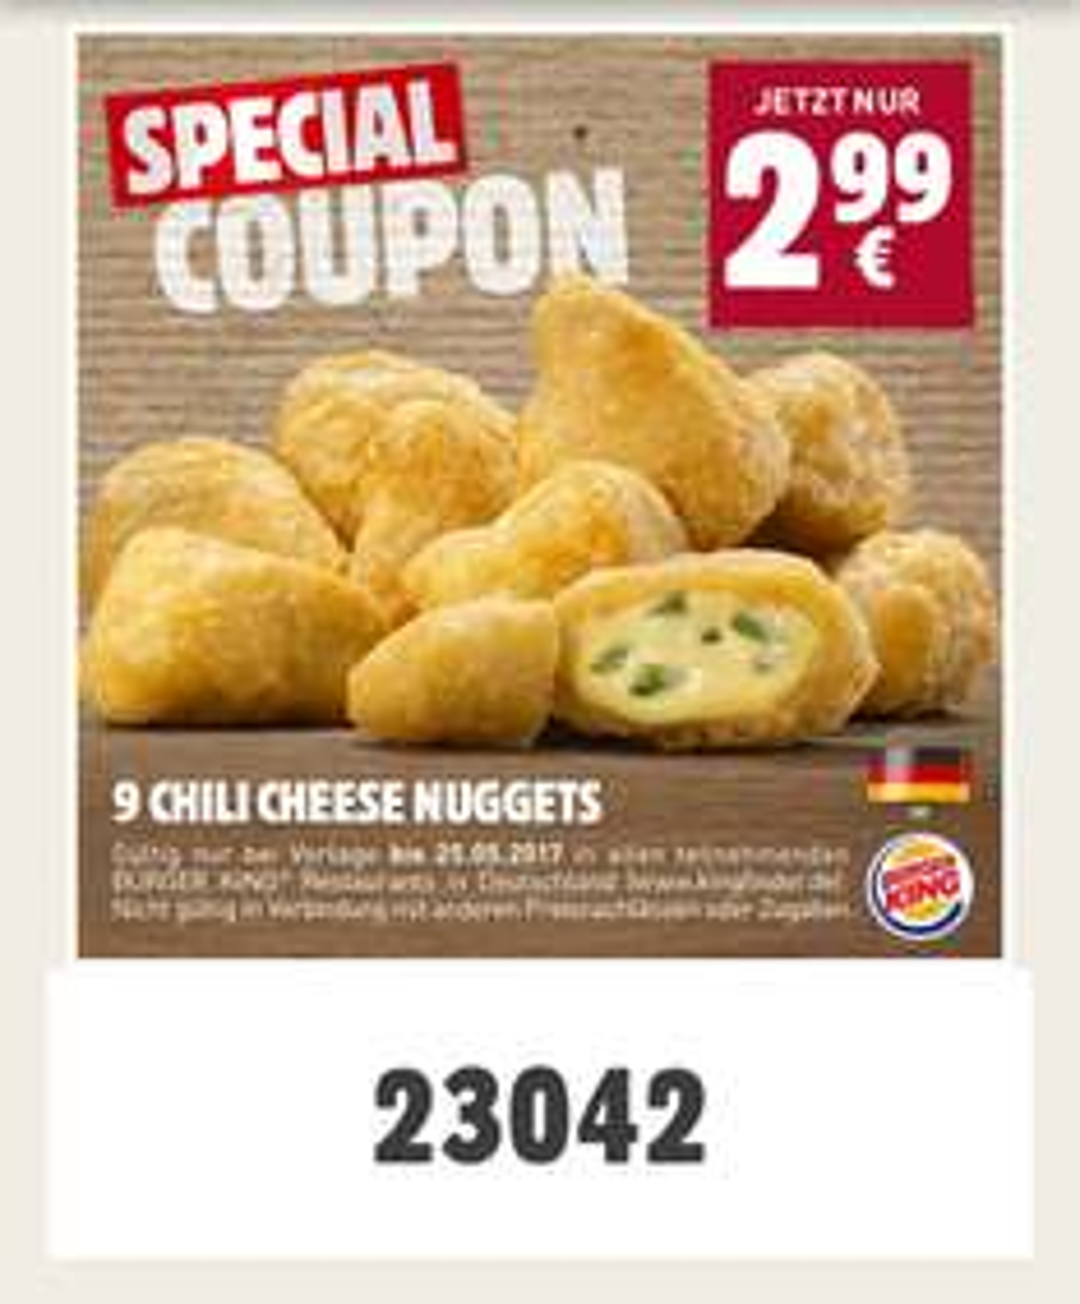 [Burger King] Chili Cheese Nuggets 9 Stück